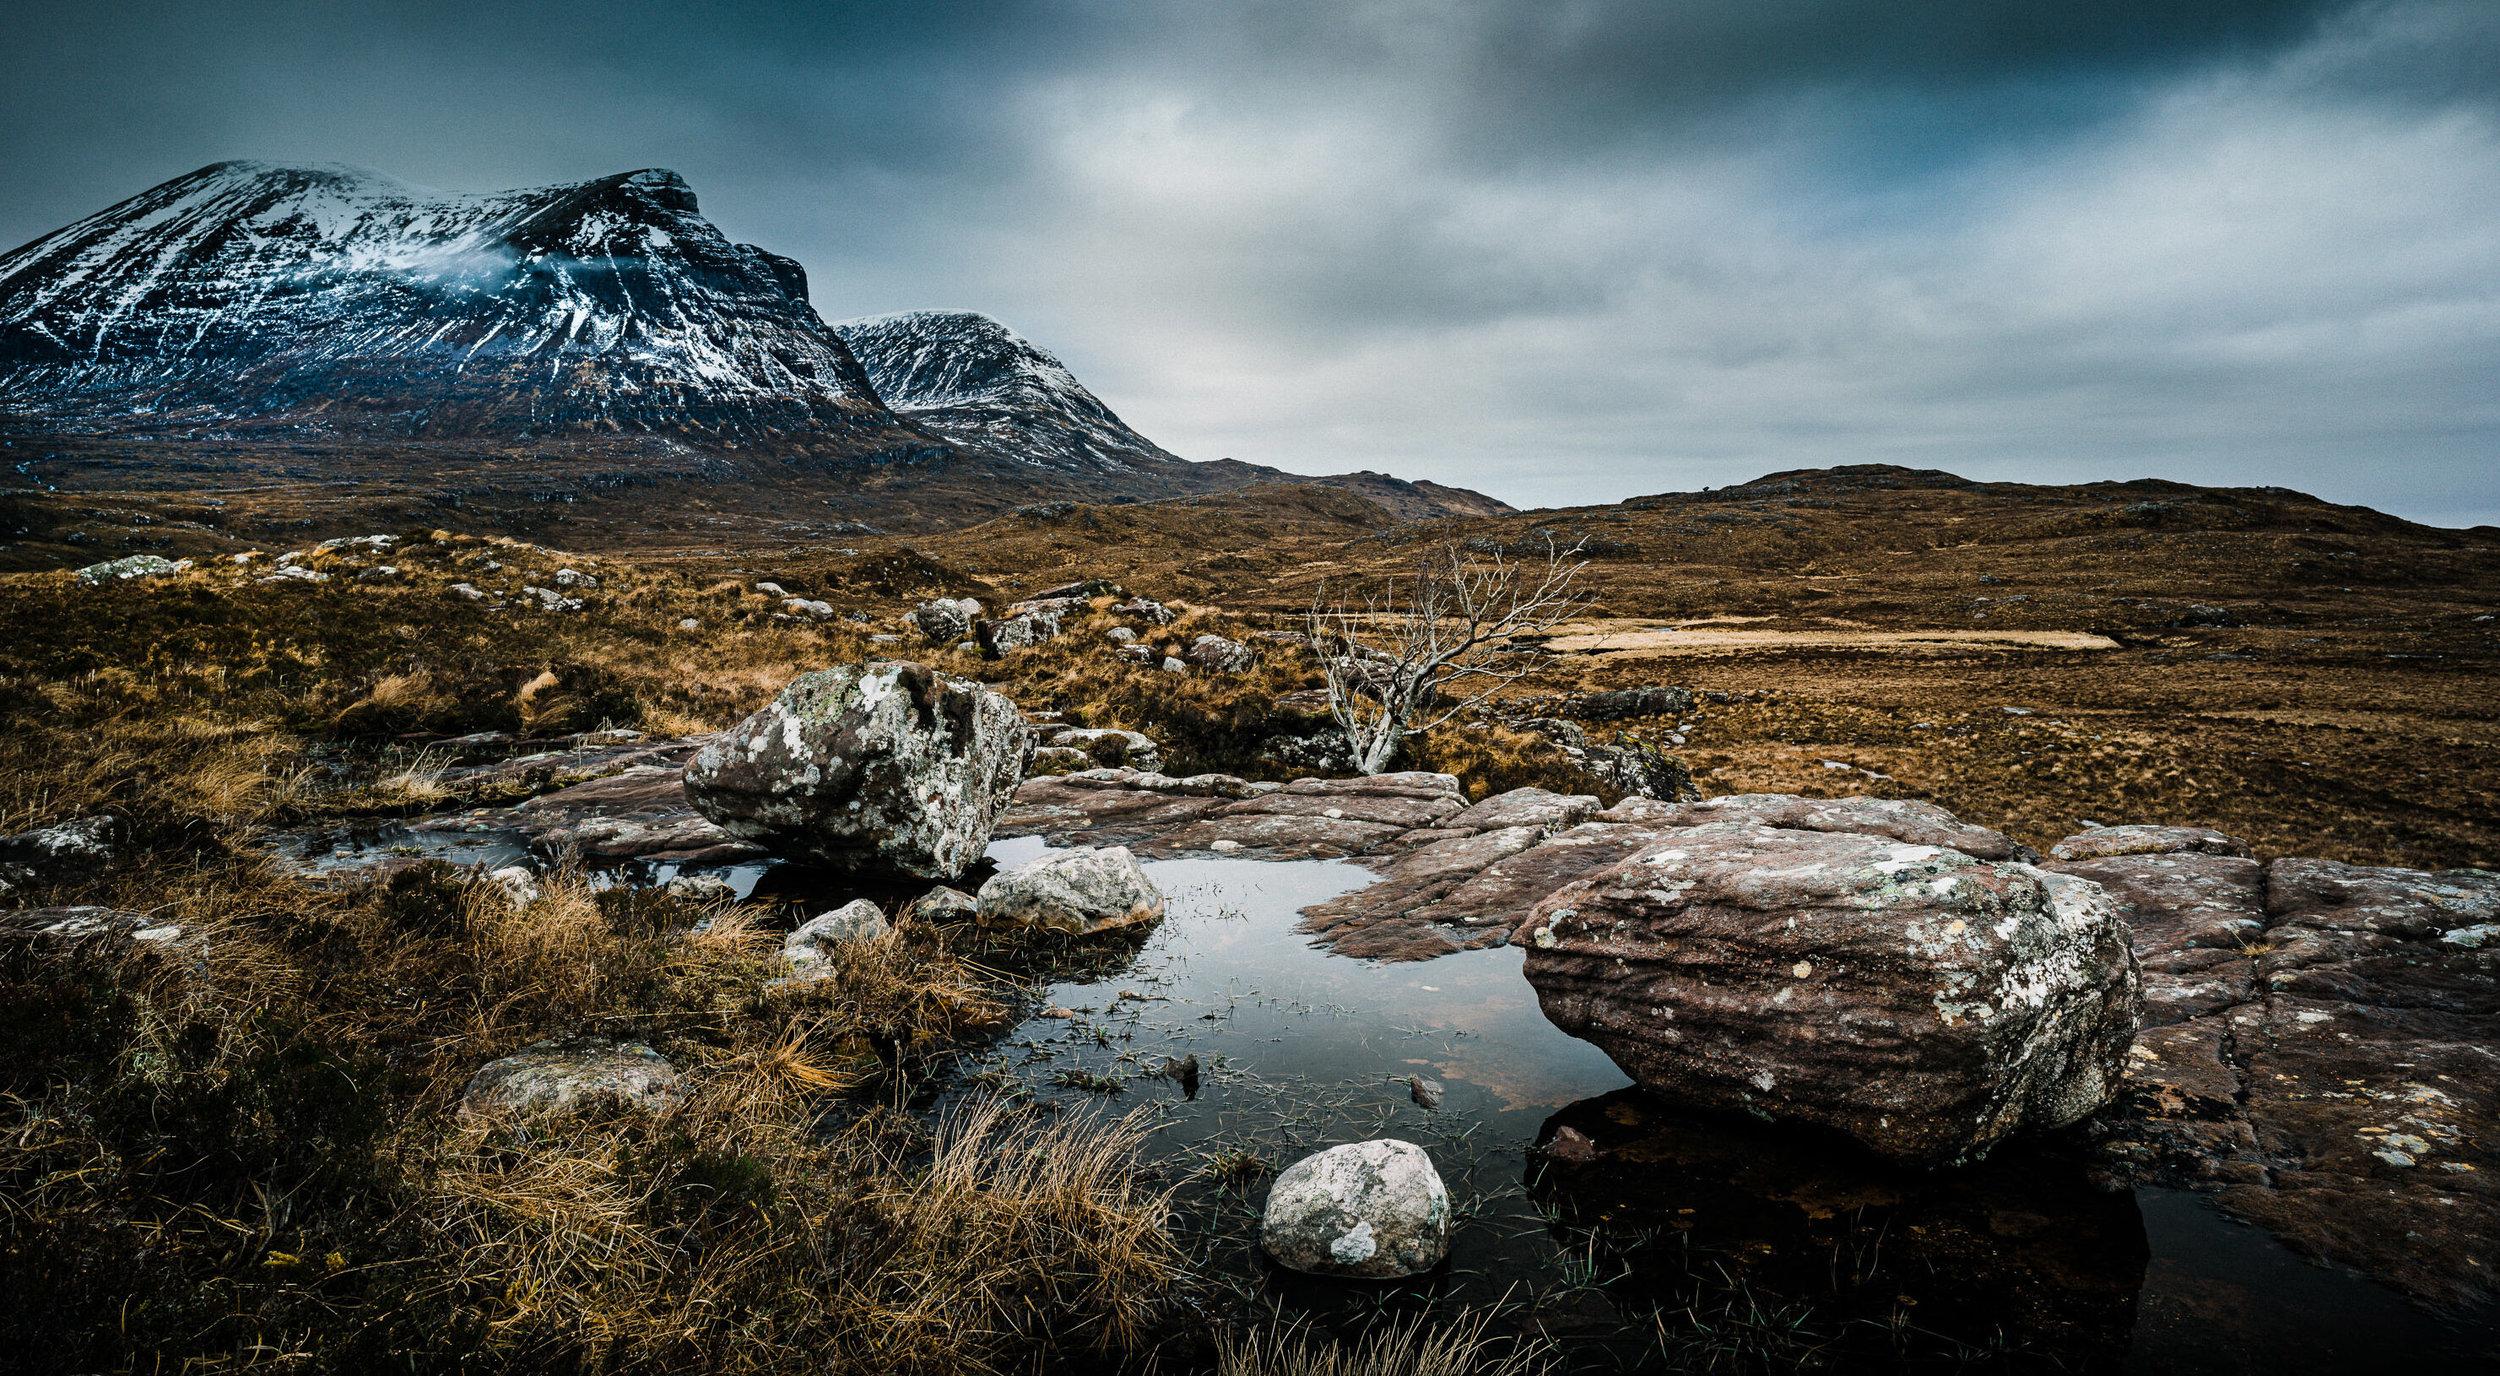 Assynth | Scottish Highlands